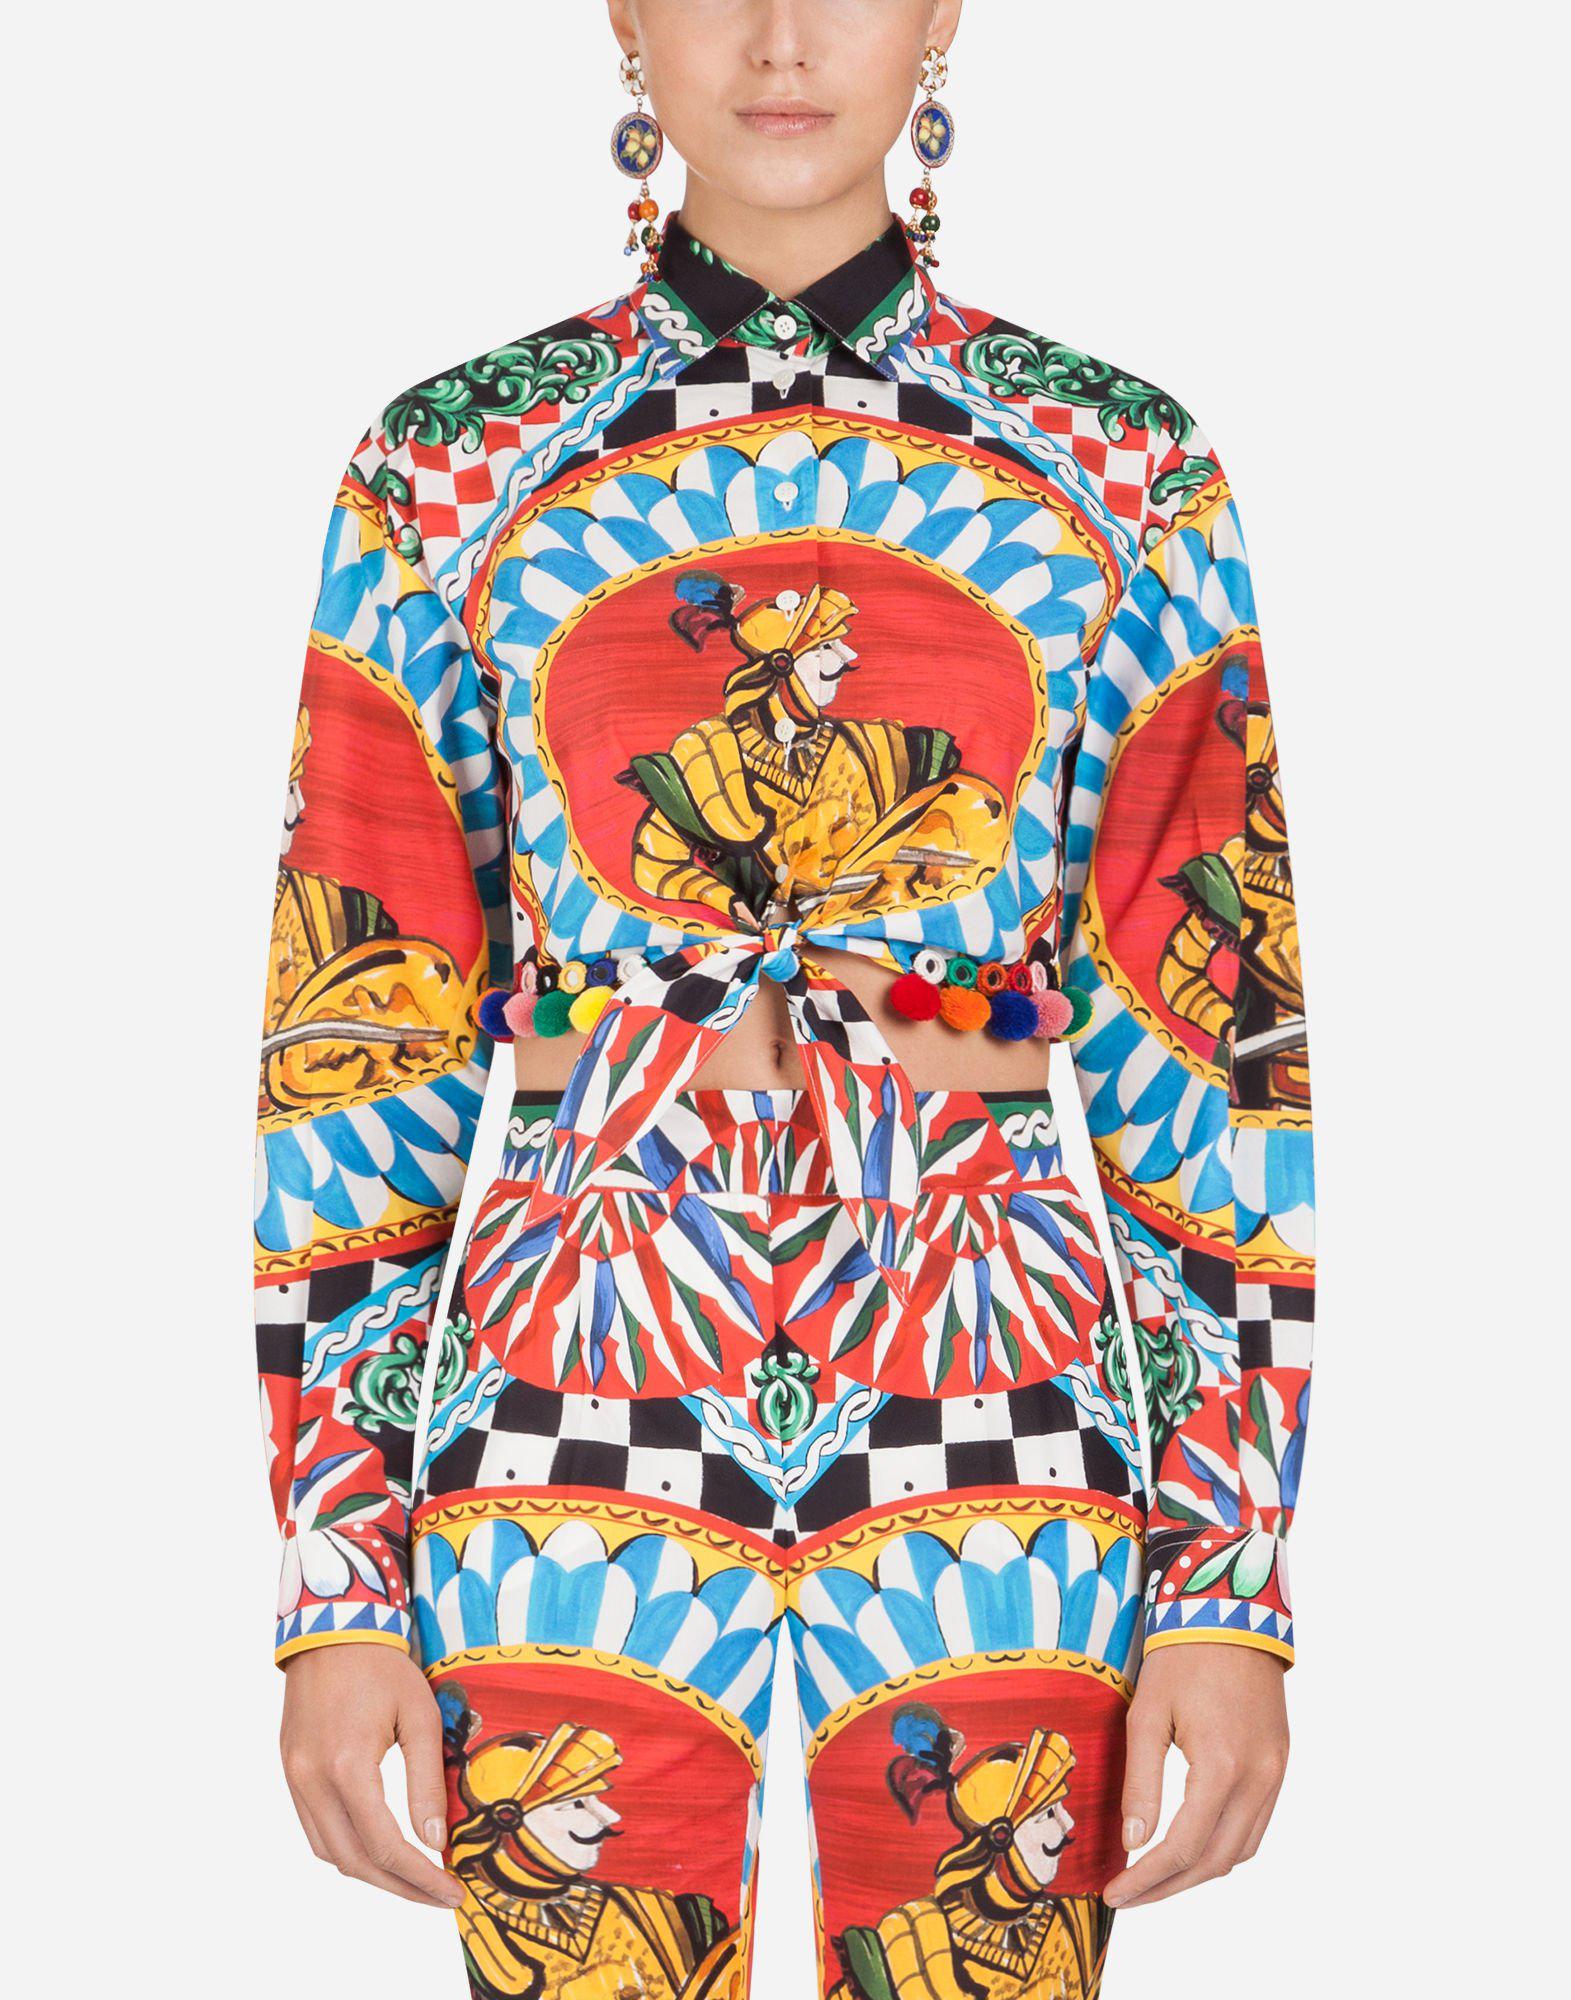 Dolce & Gabbana Sicilian Carretto Print Cotton Shirt In Red